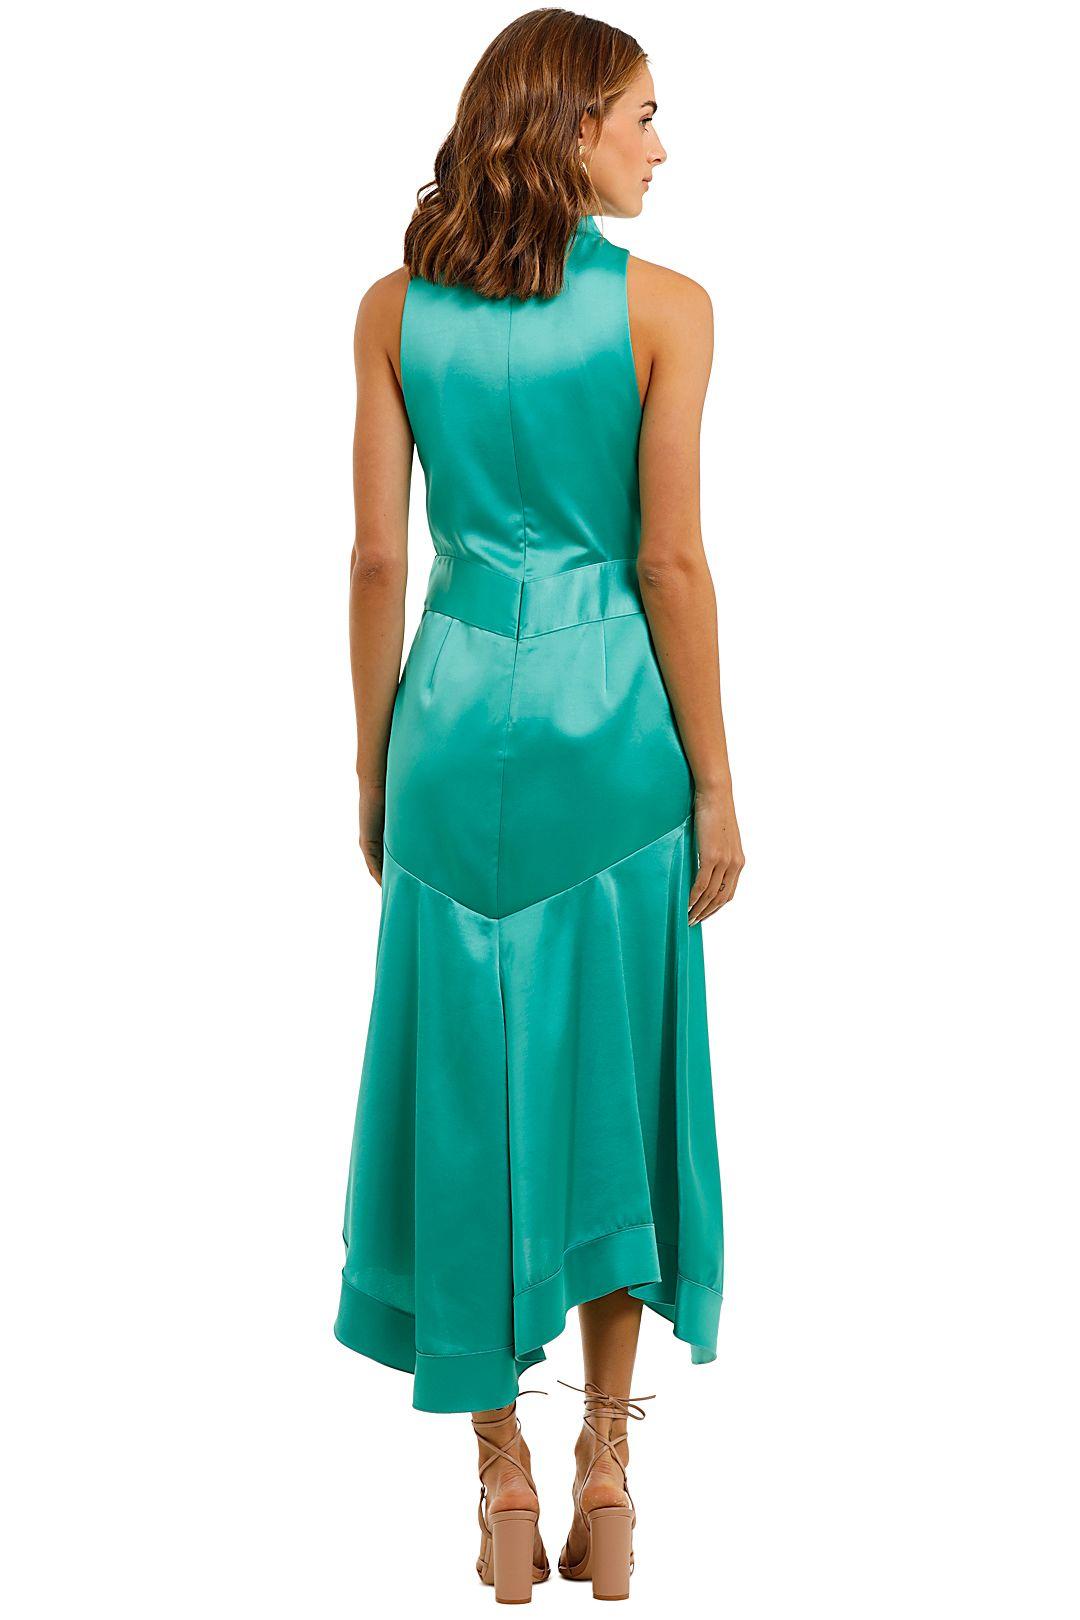 Acler Millbank Dress Green Satin